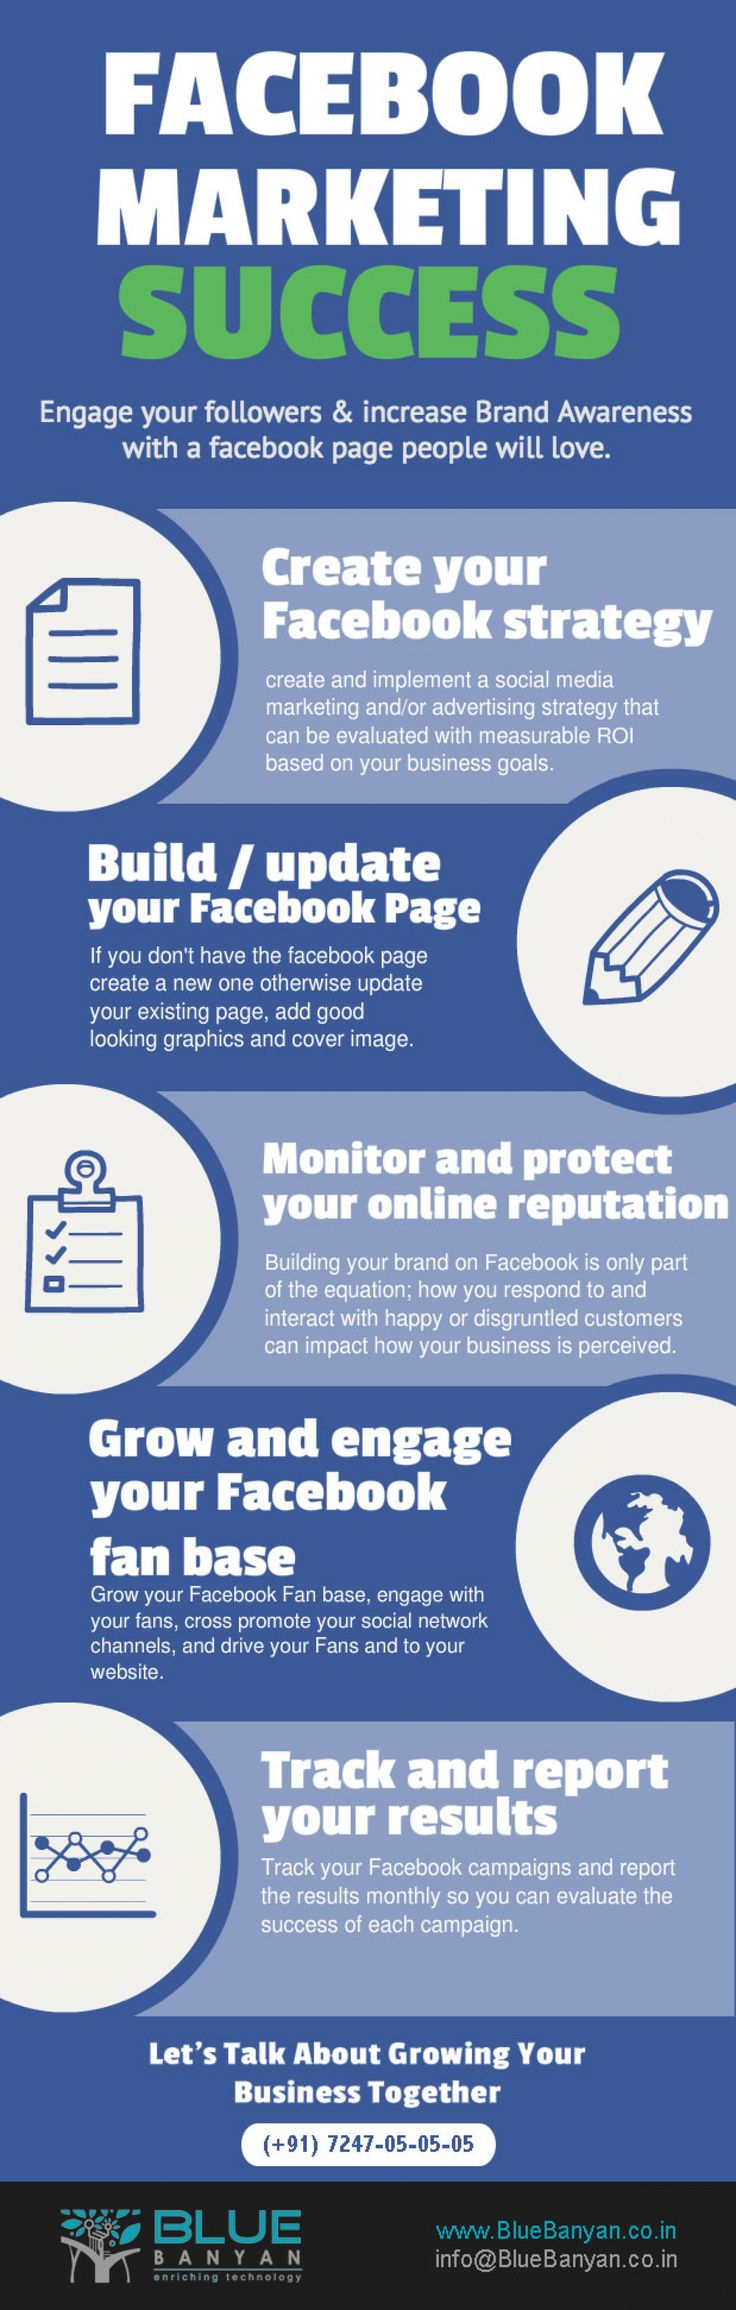 Facebook Marketing Success Tips 2017 Infographic